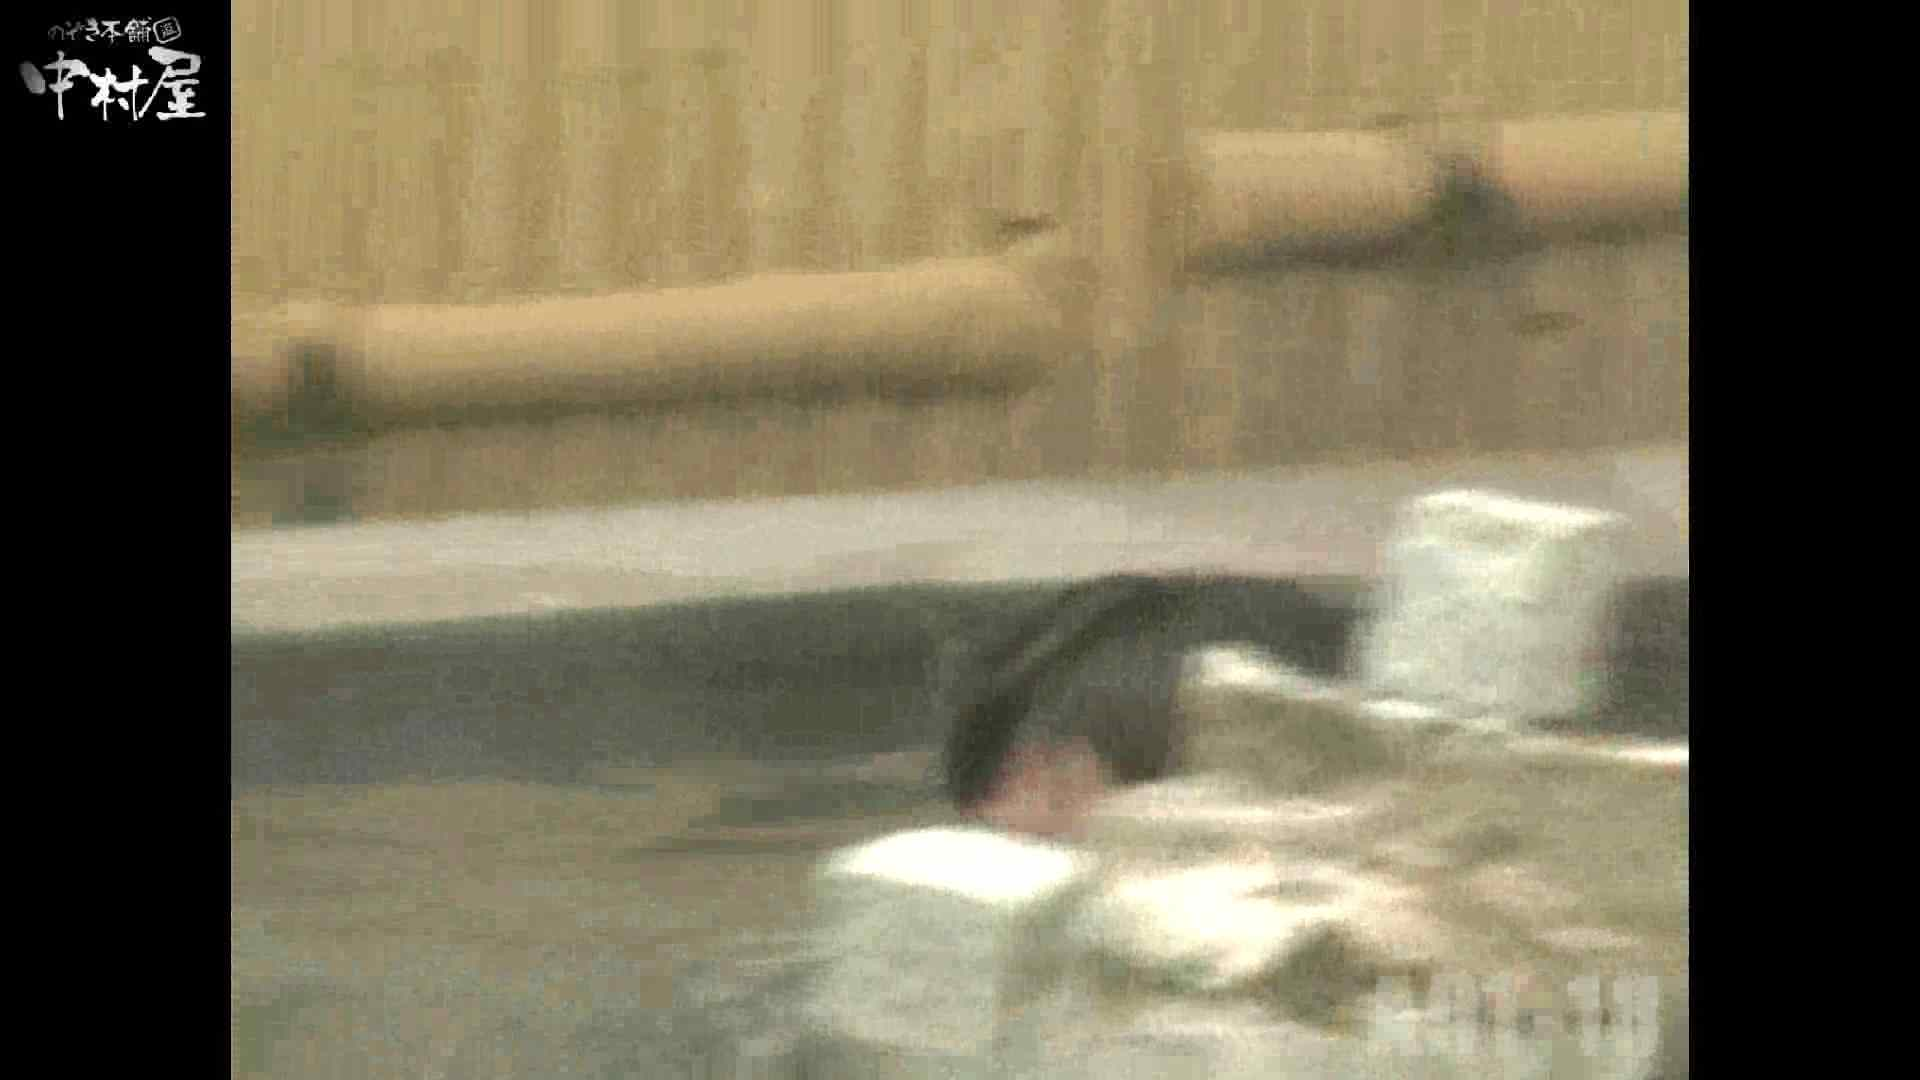 Aquaな露天風呂Vol.882潜入盗撮露天風呂十八判湯 其の七 露天 すけべAV動画紹介 84画像 35